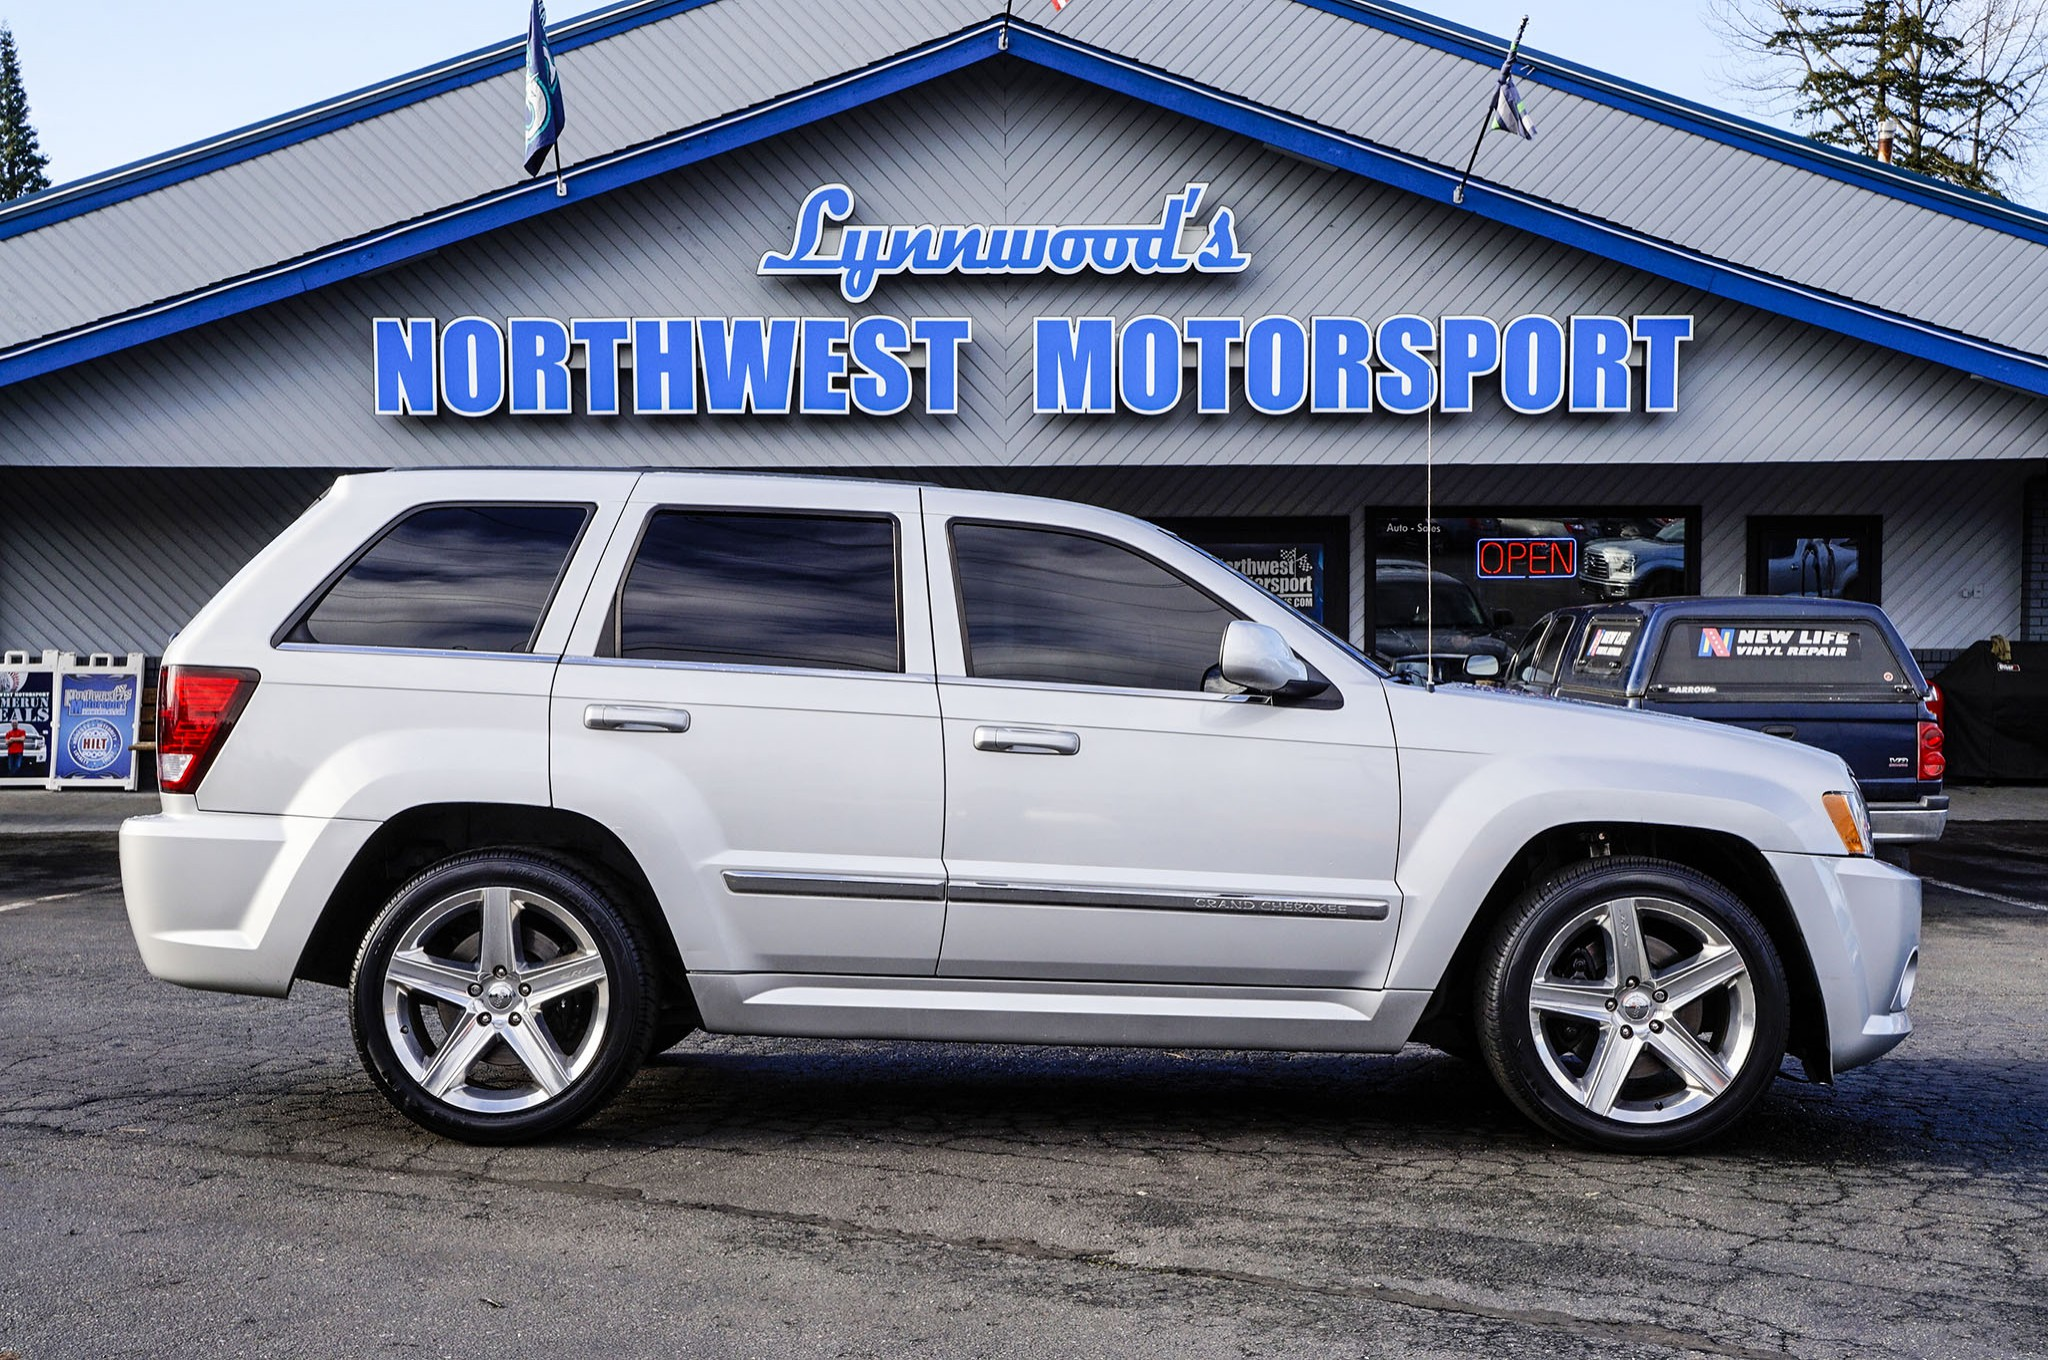 2007 jeep grand cherokee srt8 4x4 - northwest motorsport